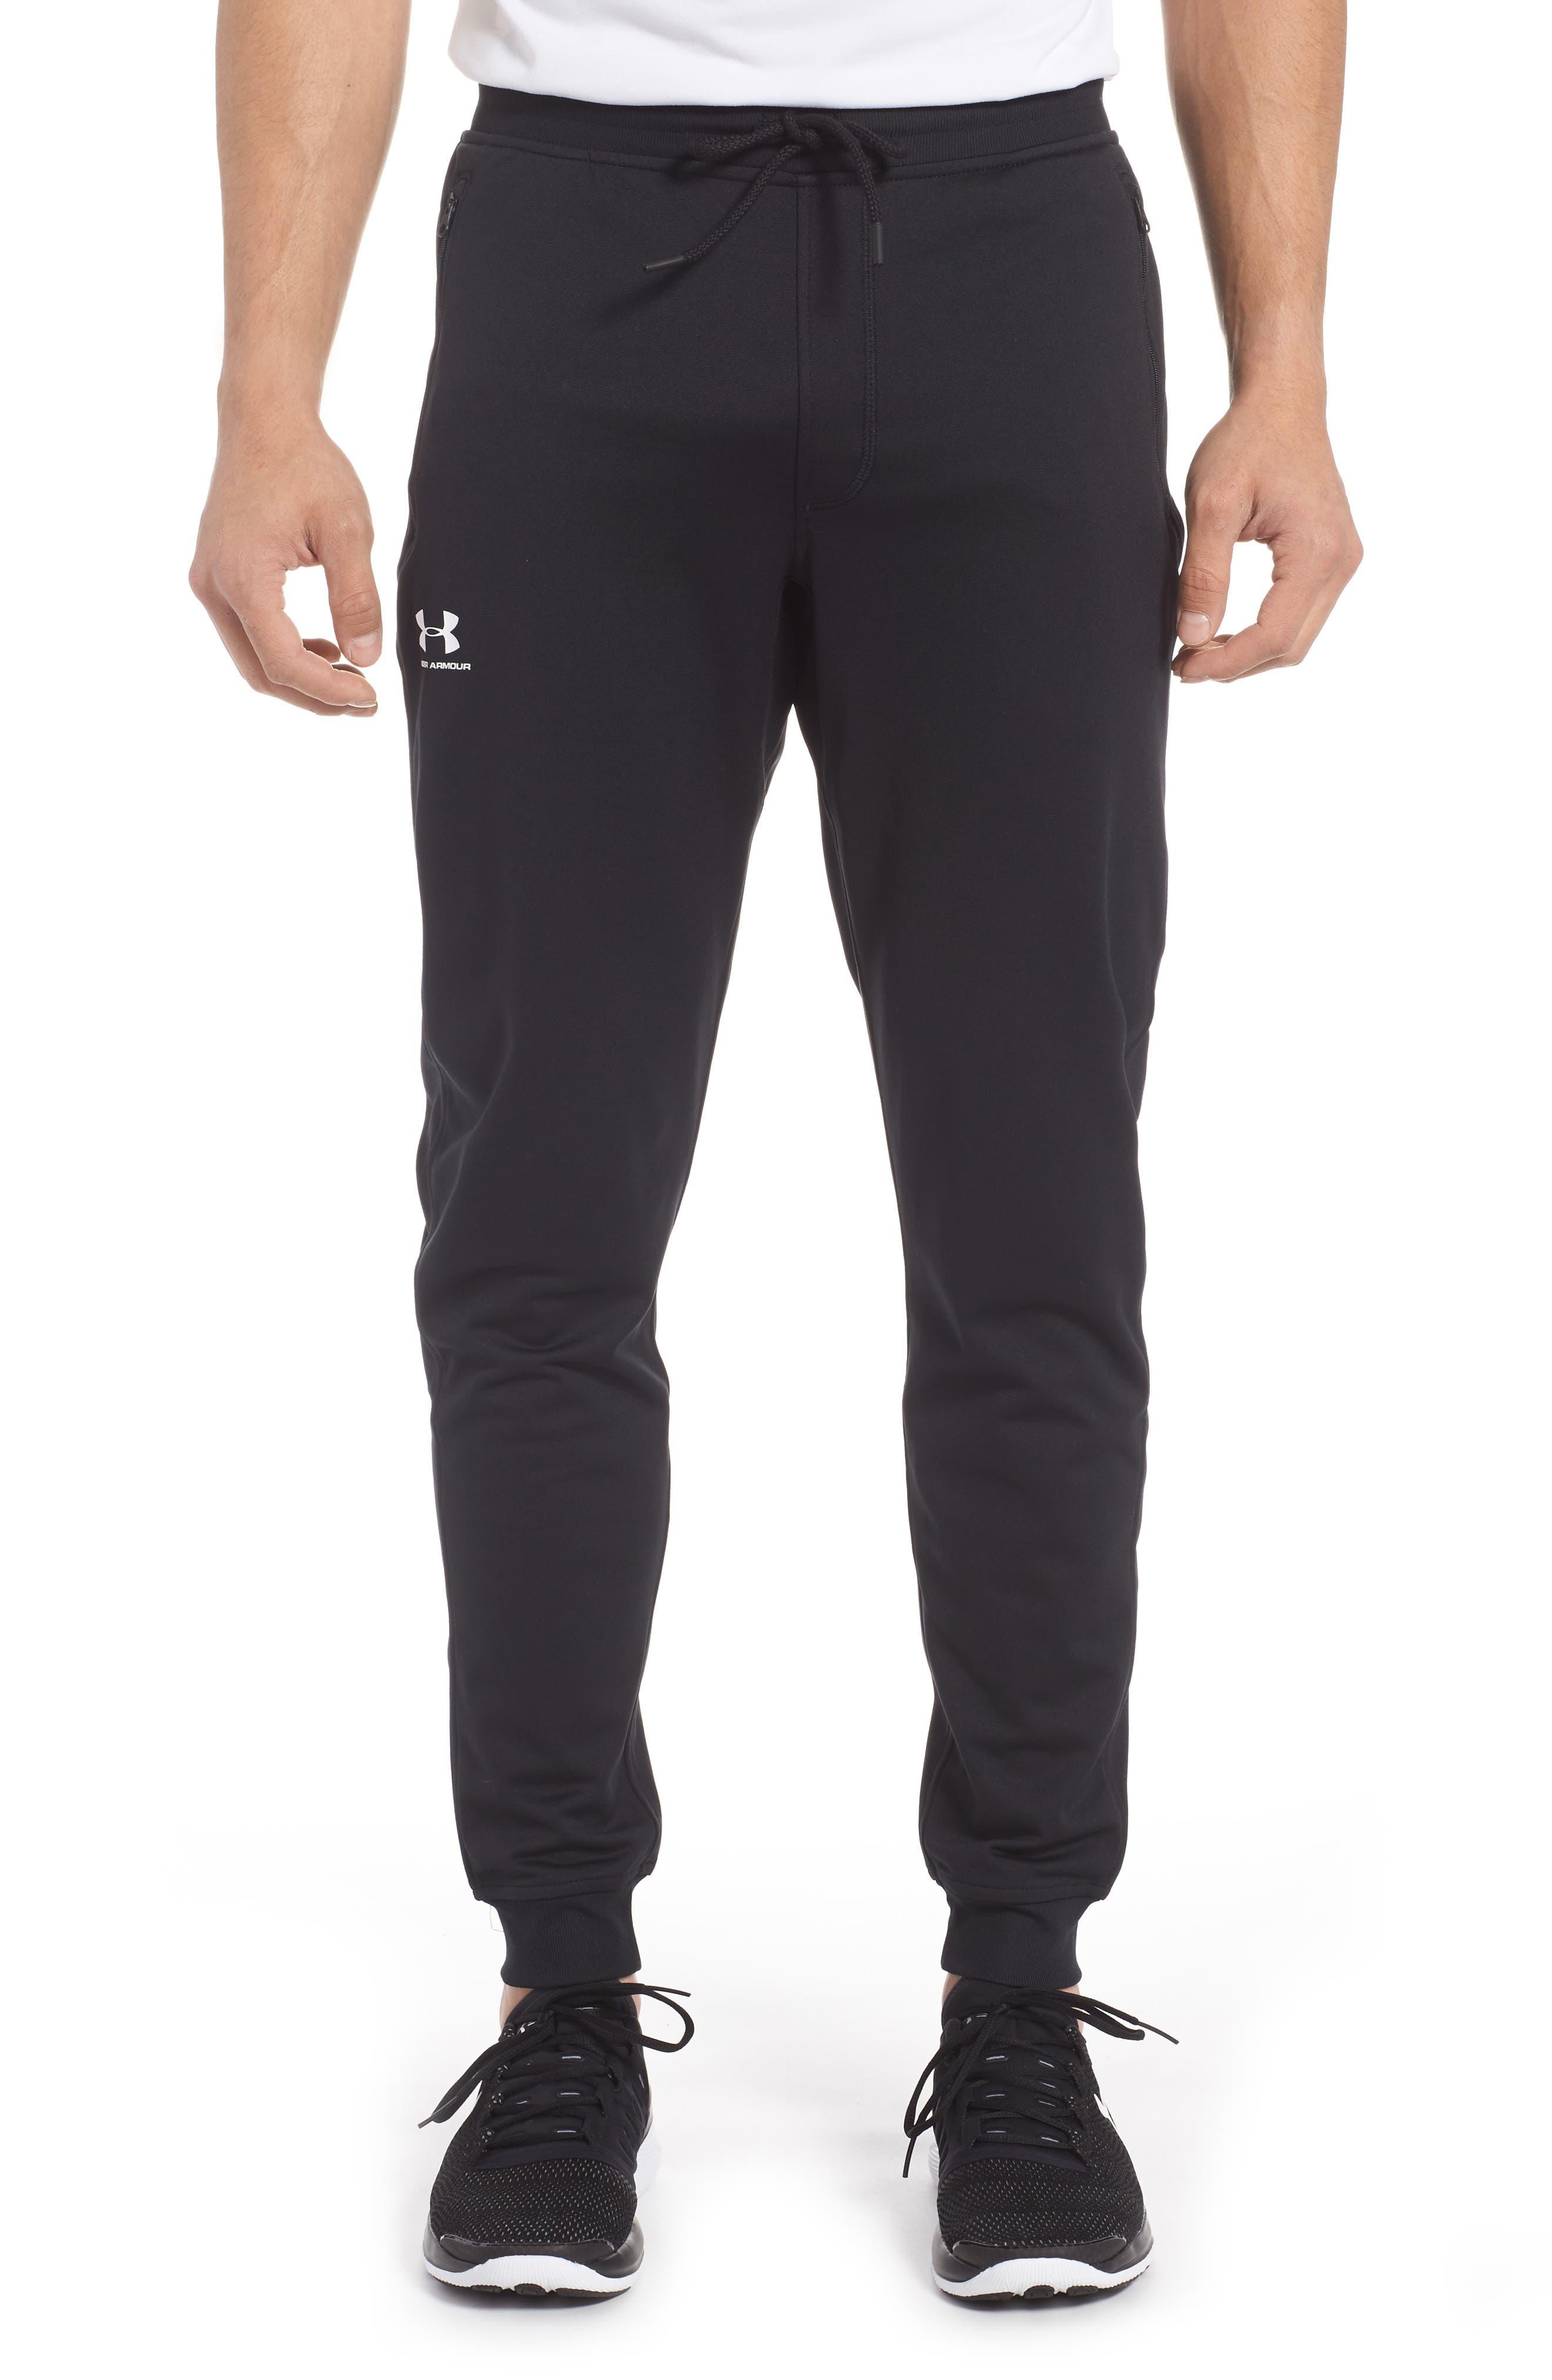 Sportstyle Knit Jogger Pants,                         Main,                         color, Black/ White